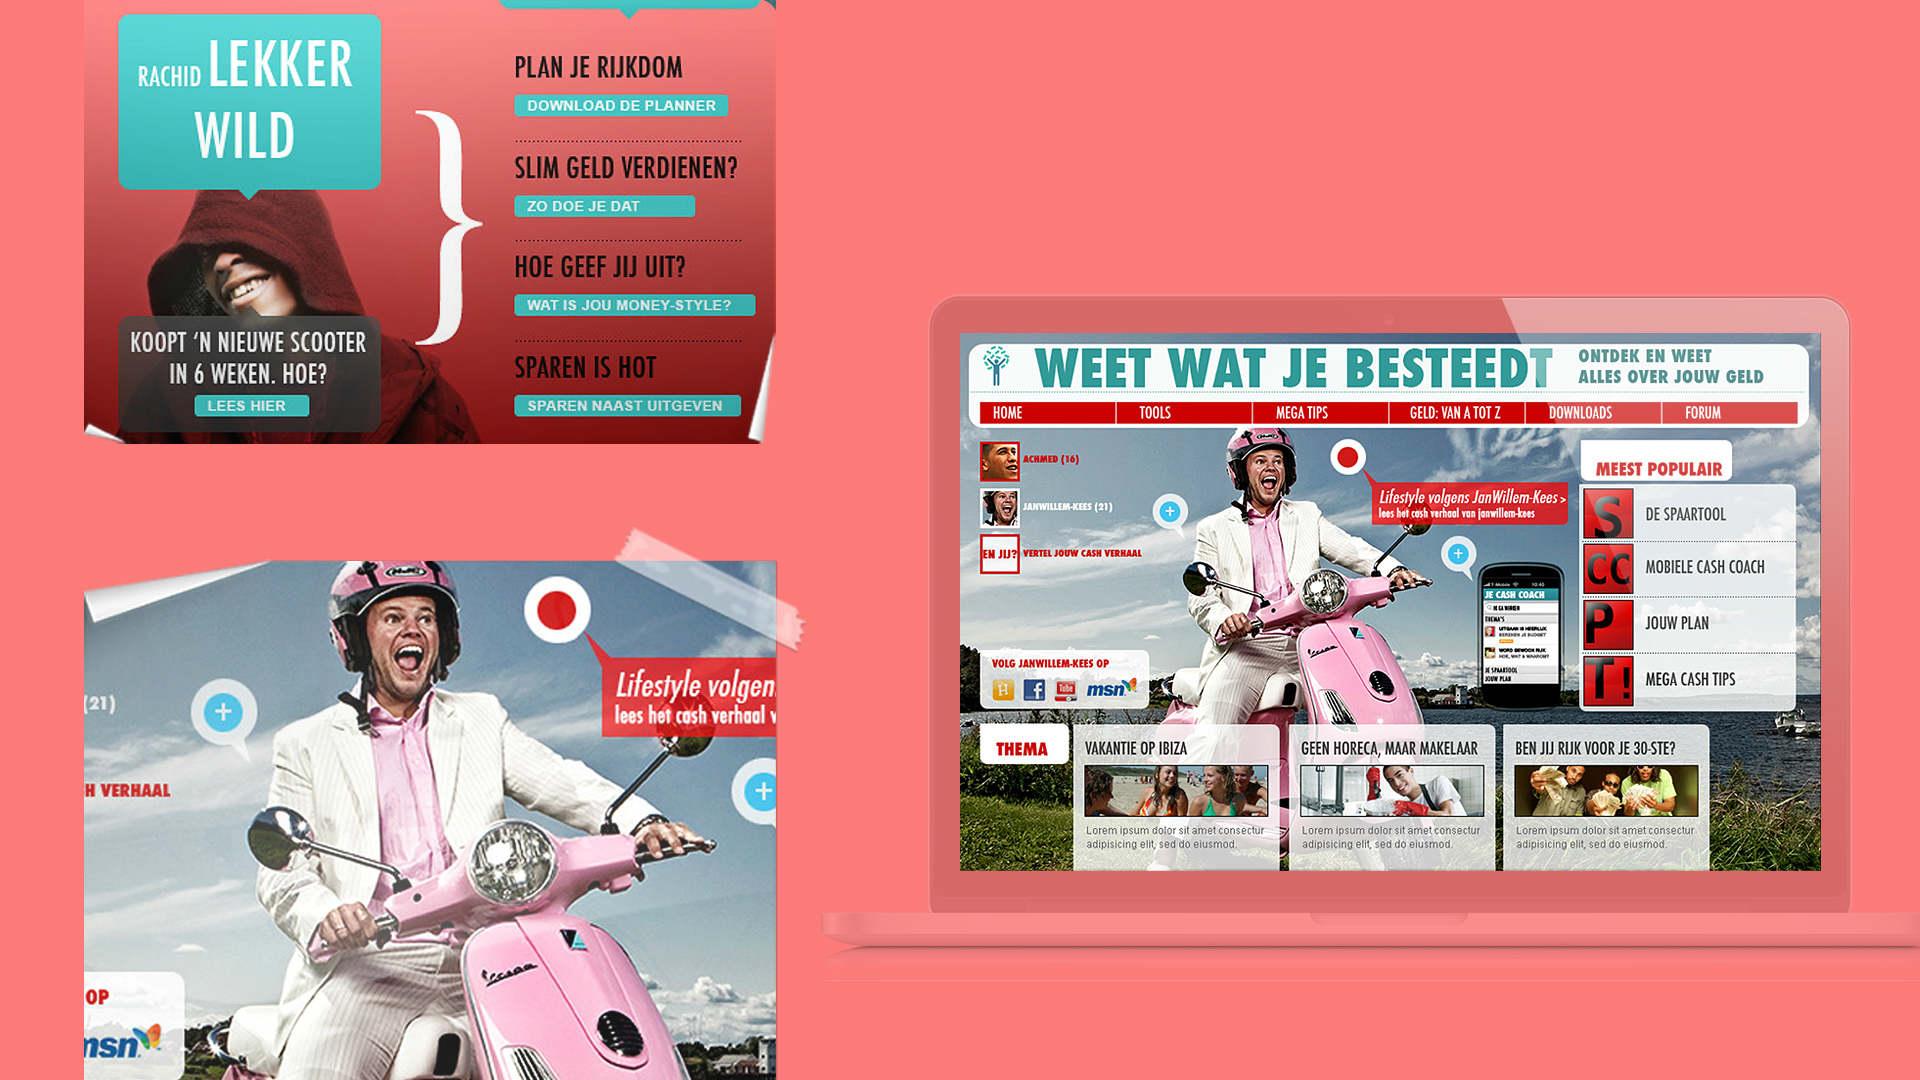 WWJB. Case. Visuals art direction, concept, branding & identity, campagne, creative consultancy, design. Sham Ramessar